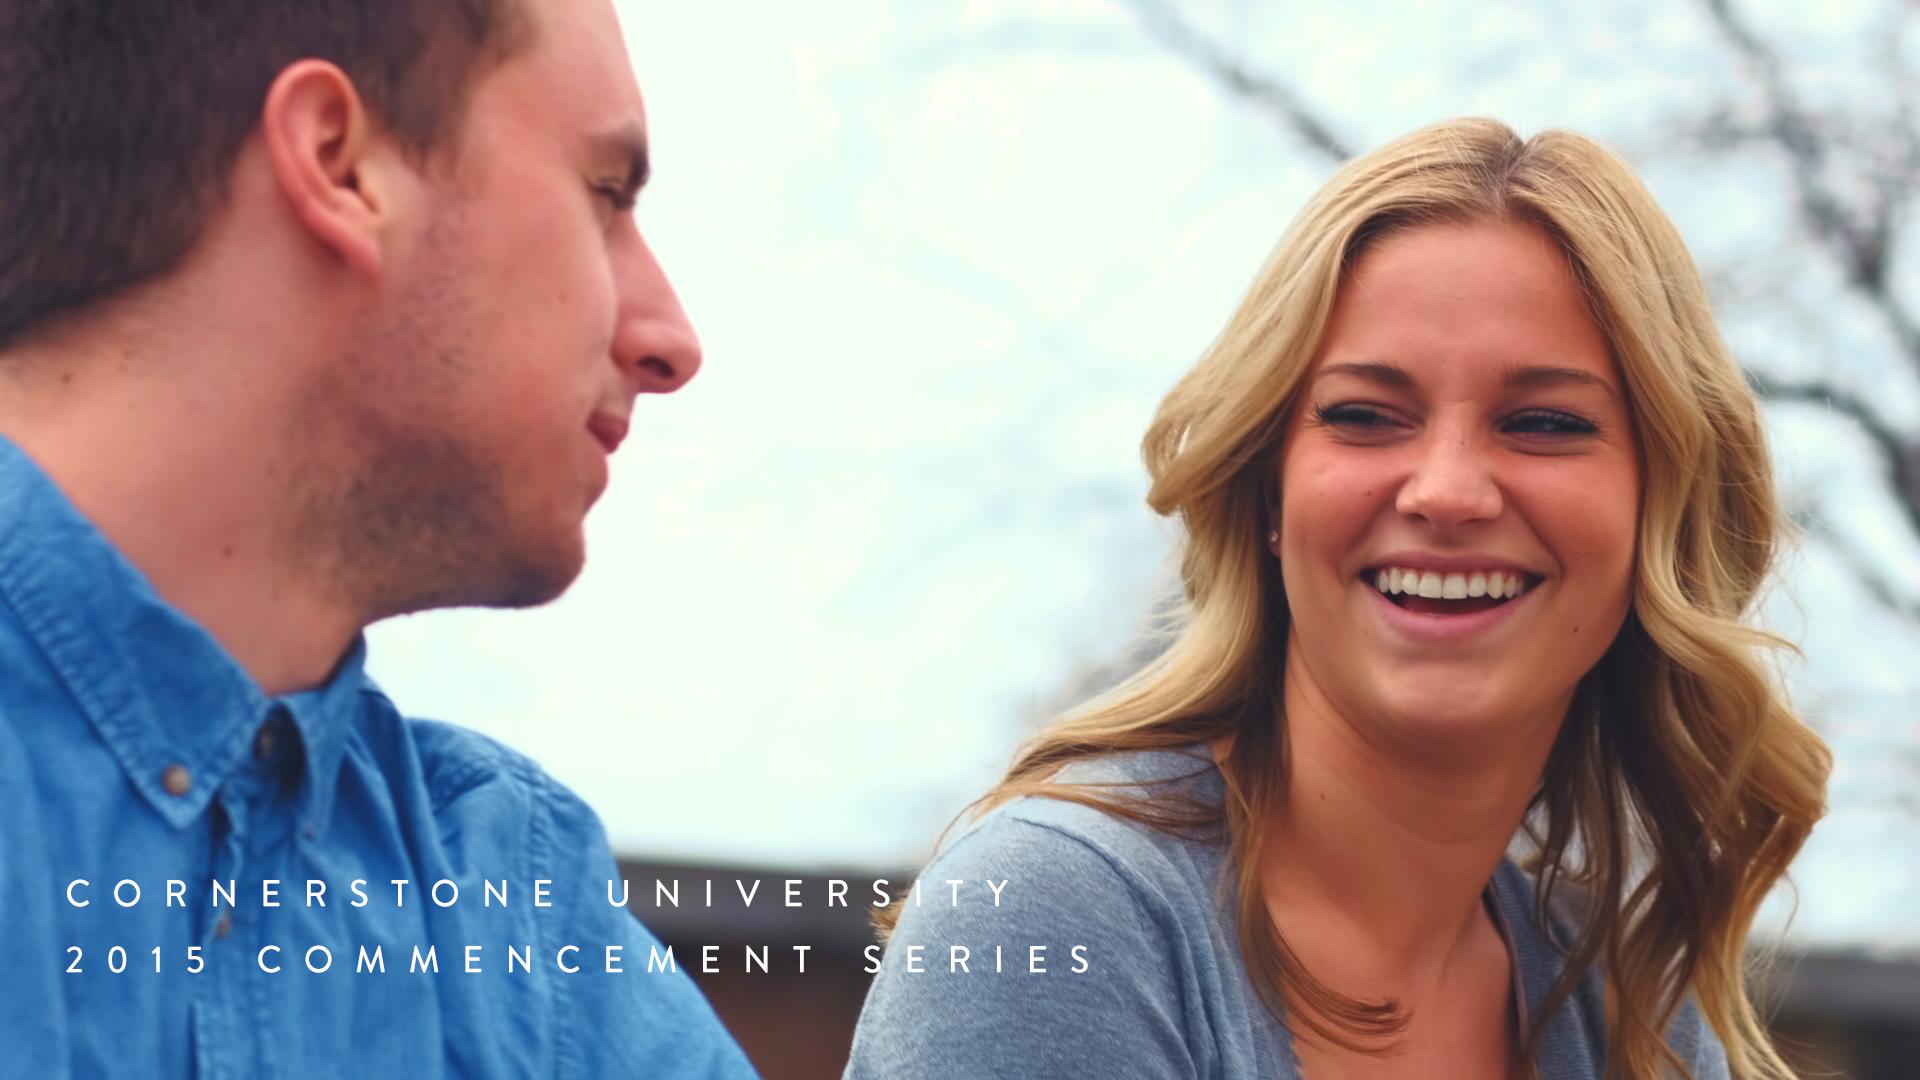 Cornerstone-University-Michigan-2015-Commencement-Corporate-Film-Series